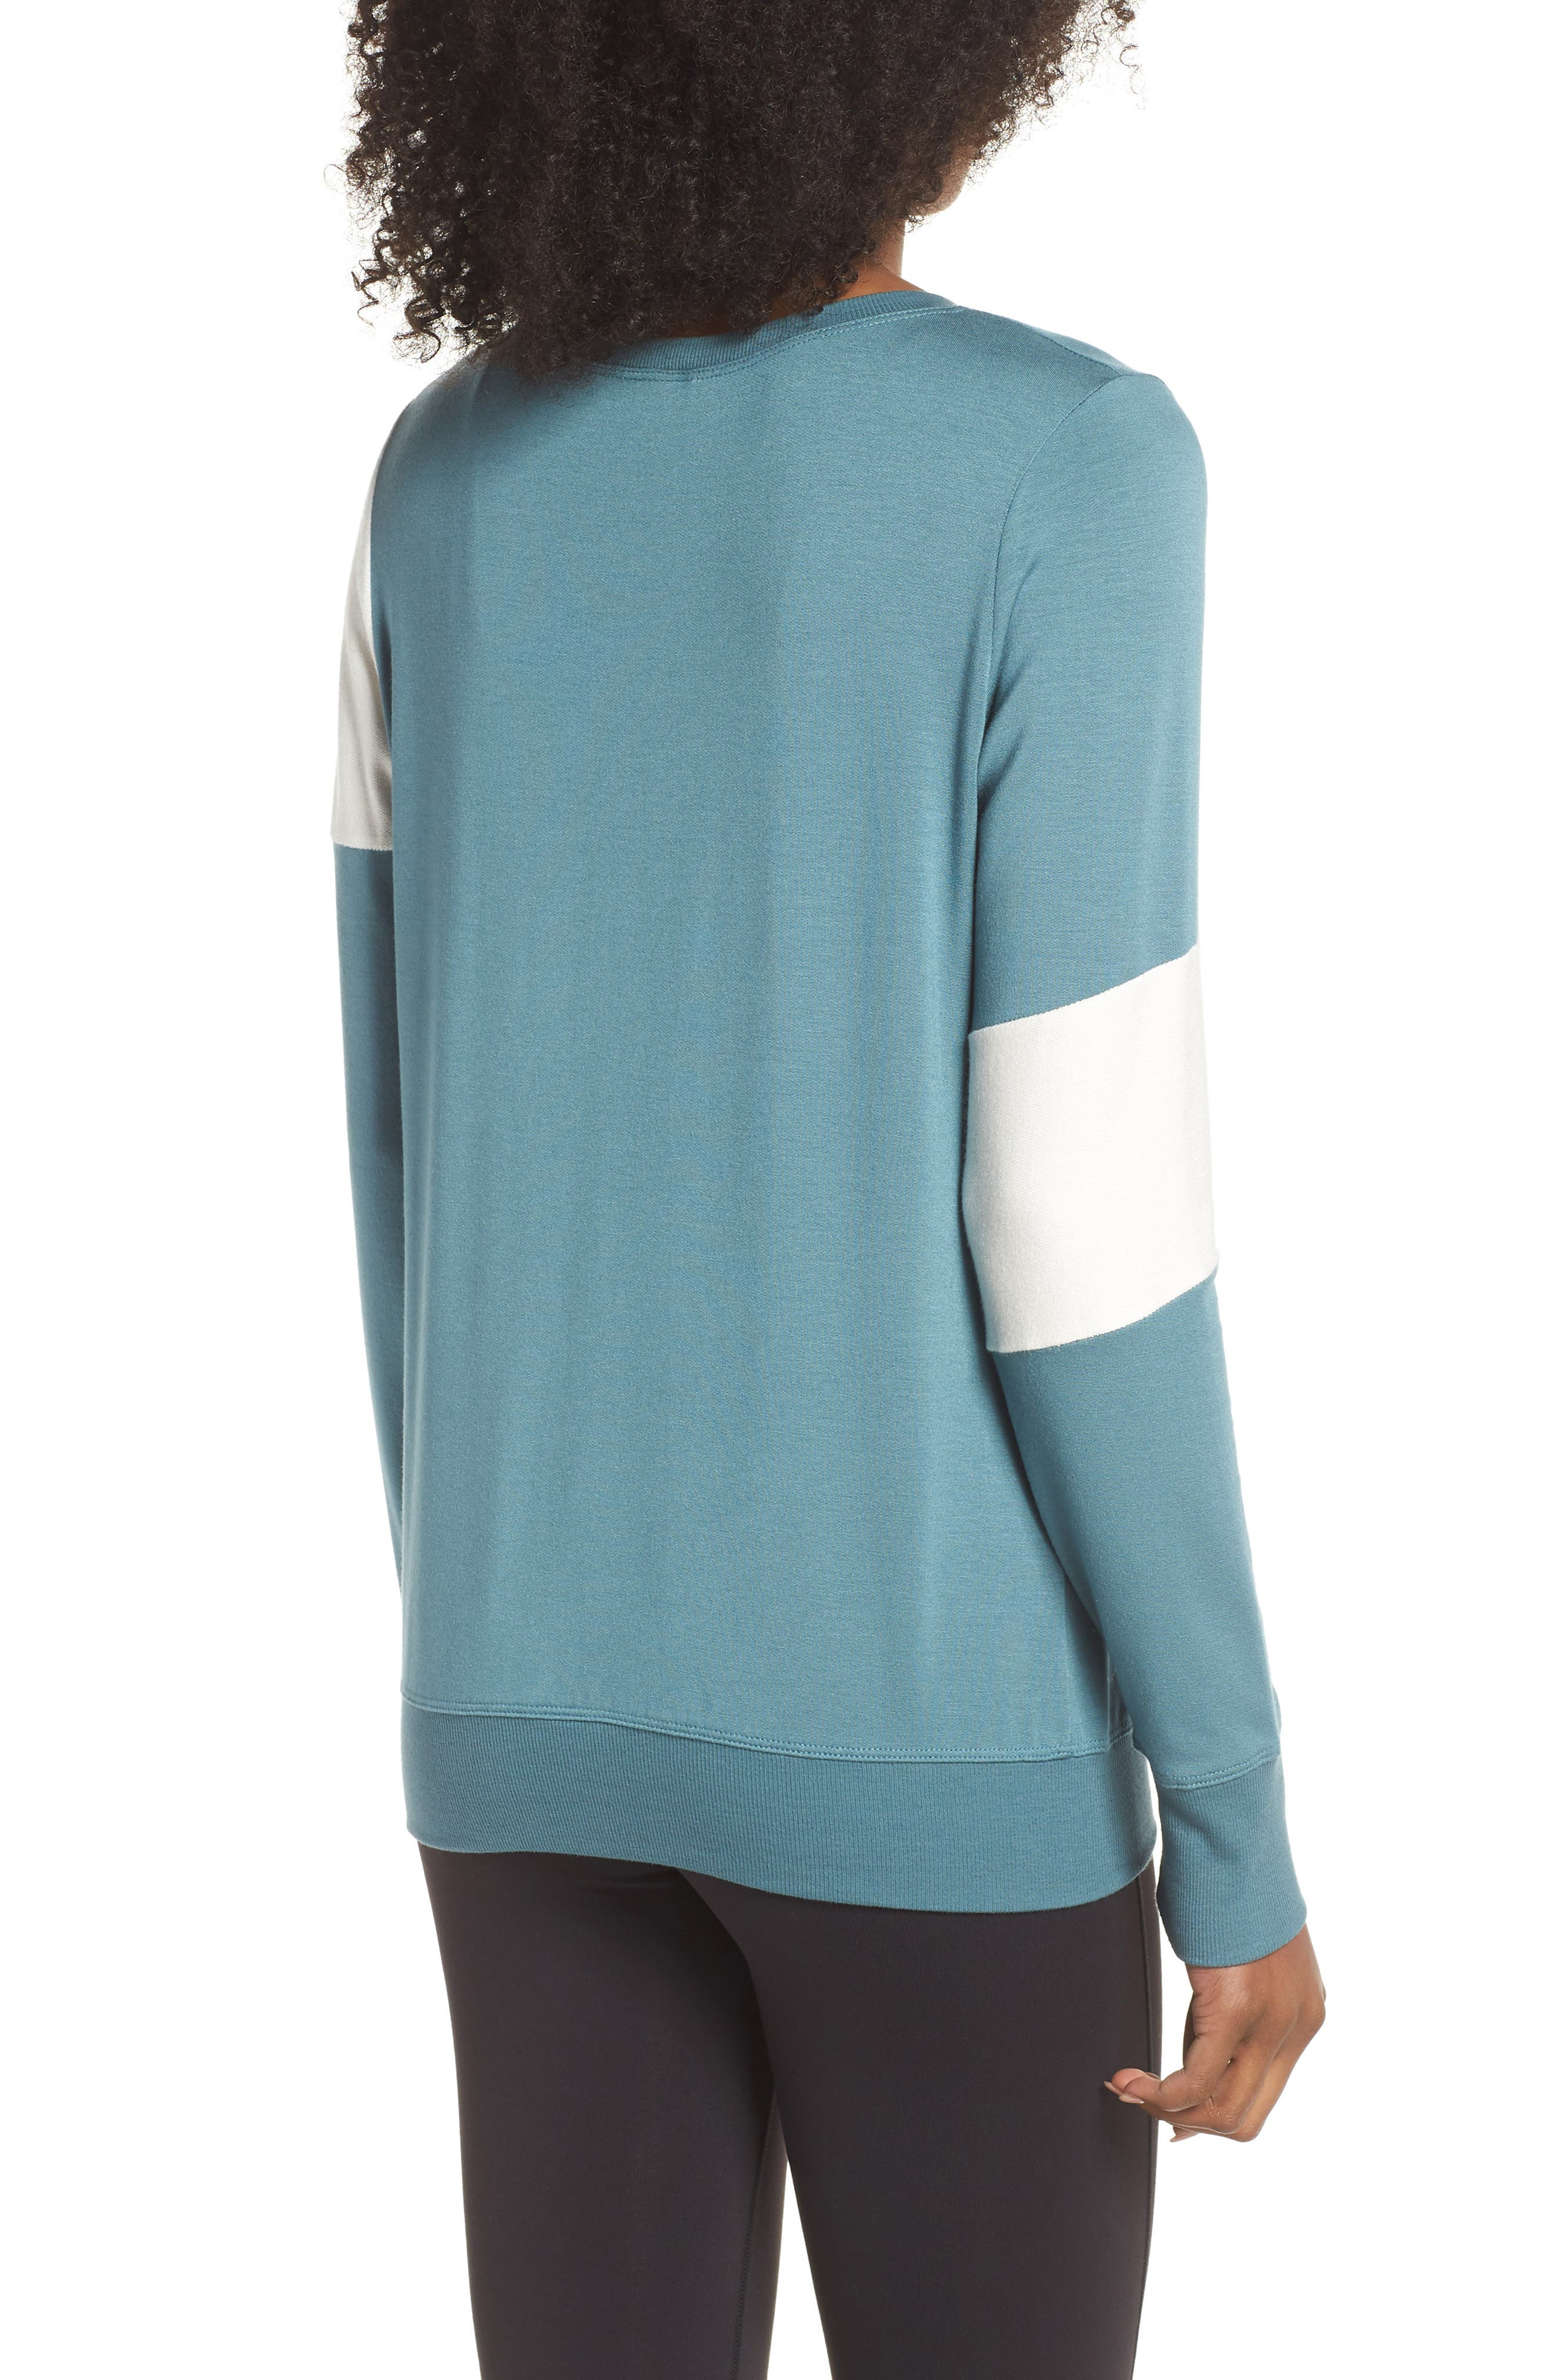 Ramp Sweatshirt,                             Alternate thumbnail 2, color,                             Blue Surf/ Off White